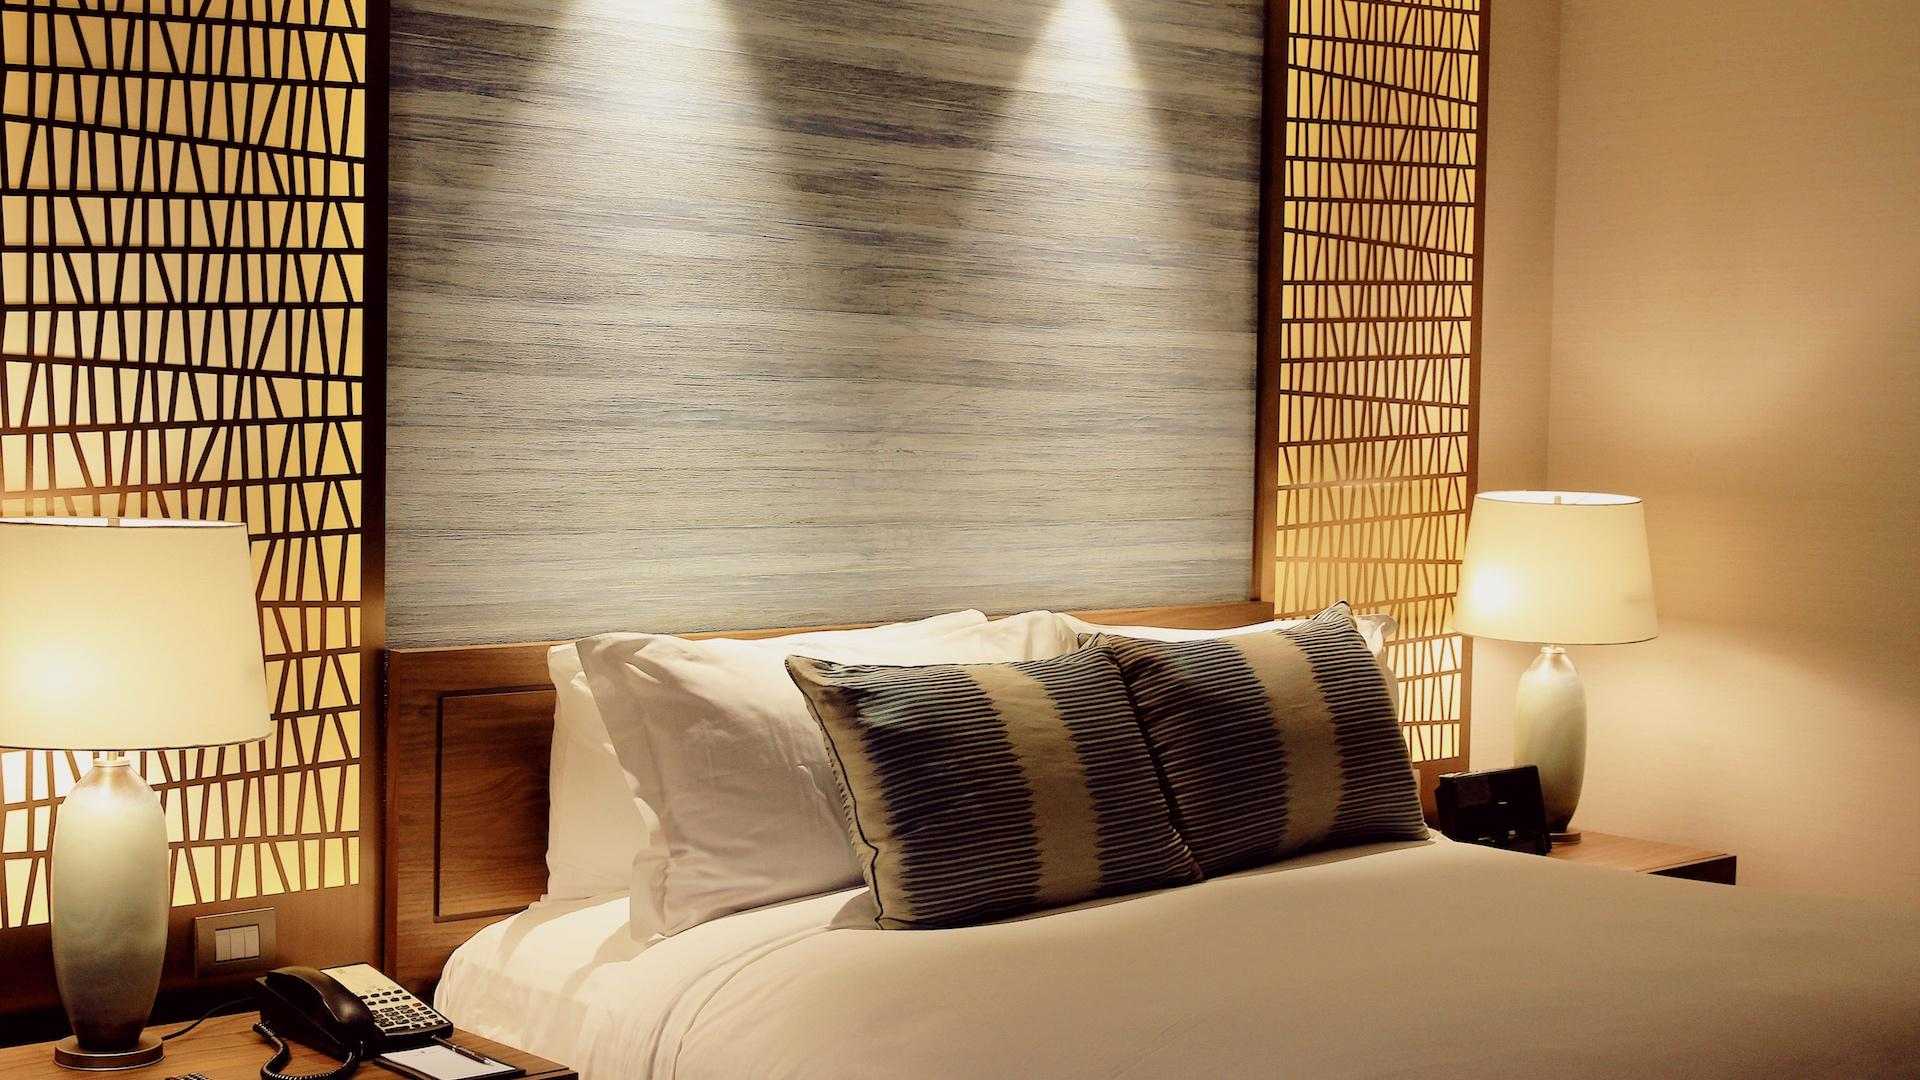 REVIEW Hotel Ritz-Carlton Santiago: Chile a puro estilo